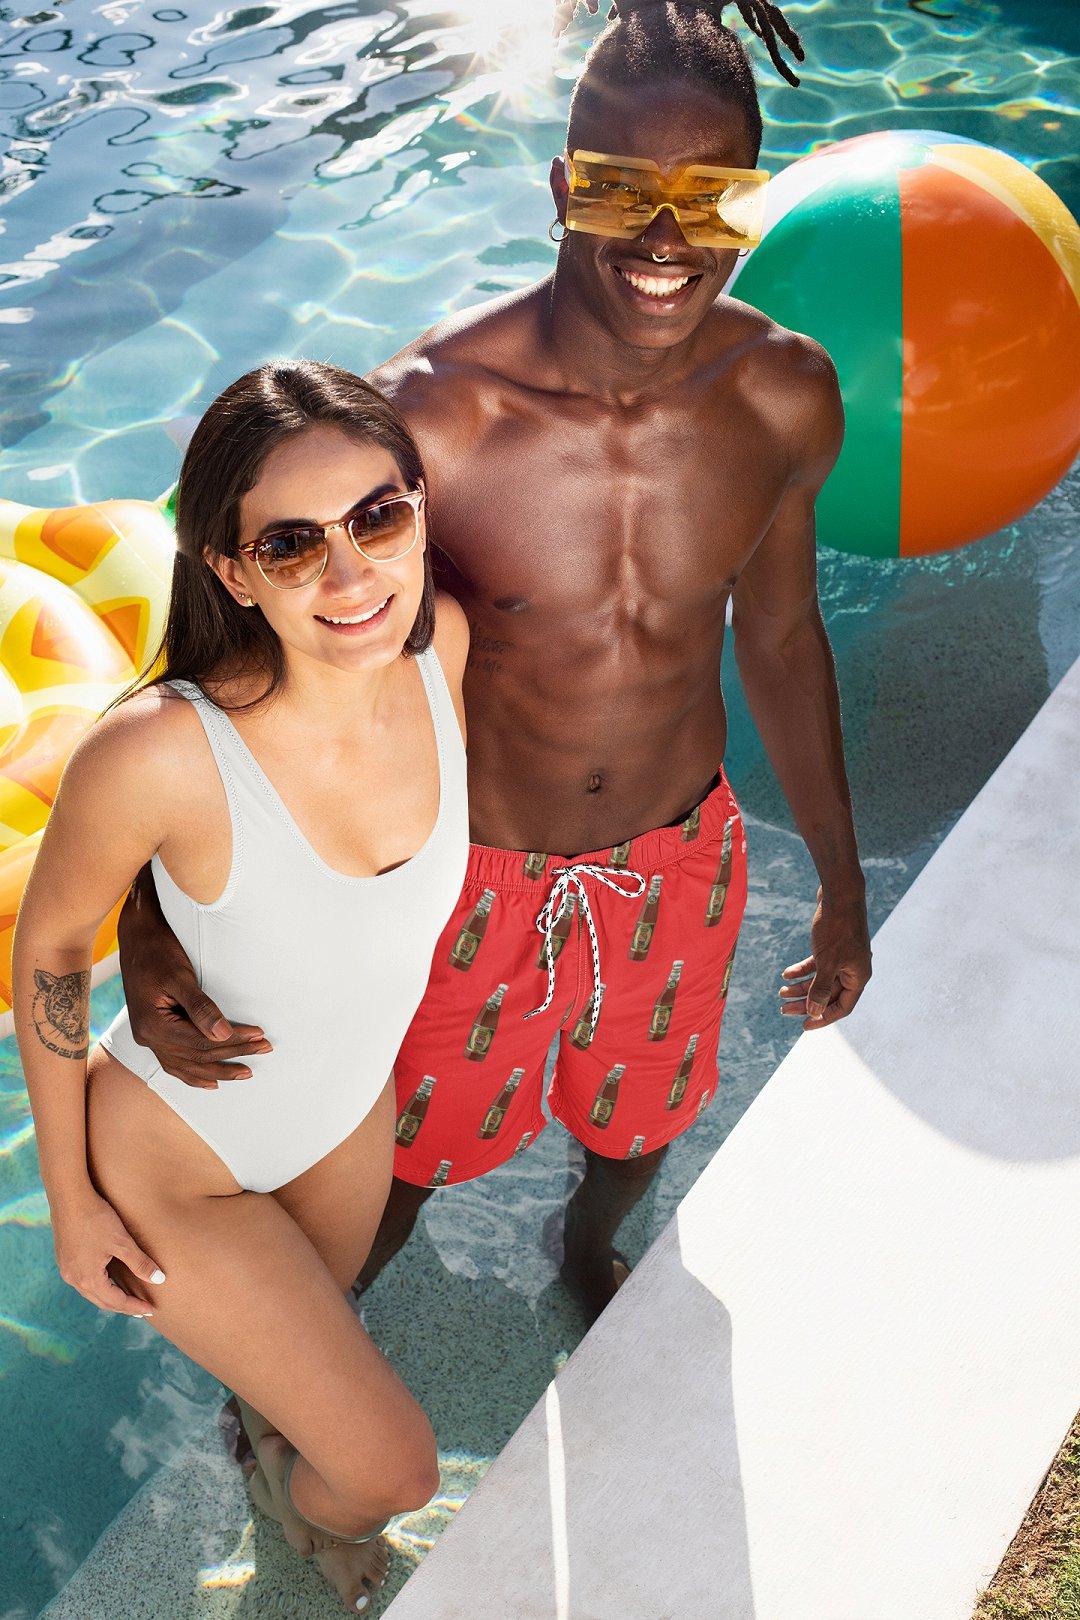 Dalebrook swimwear